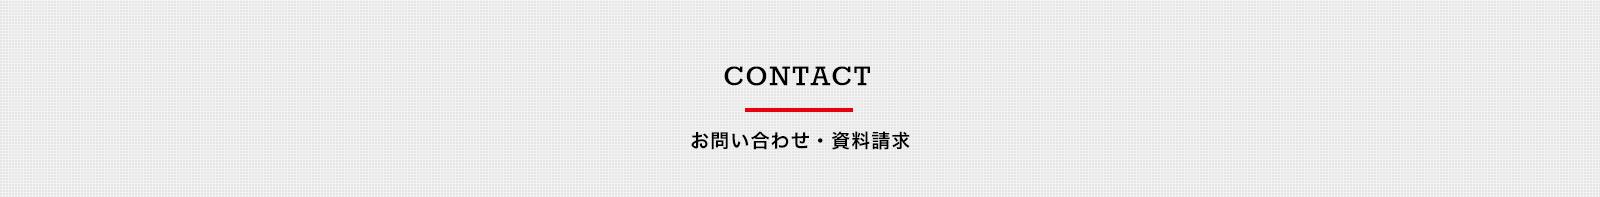 contact_top_banner